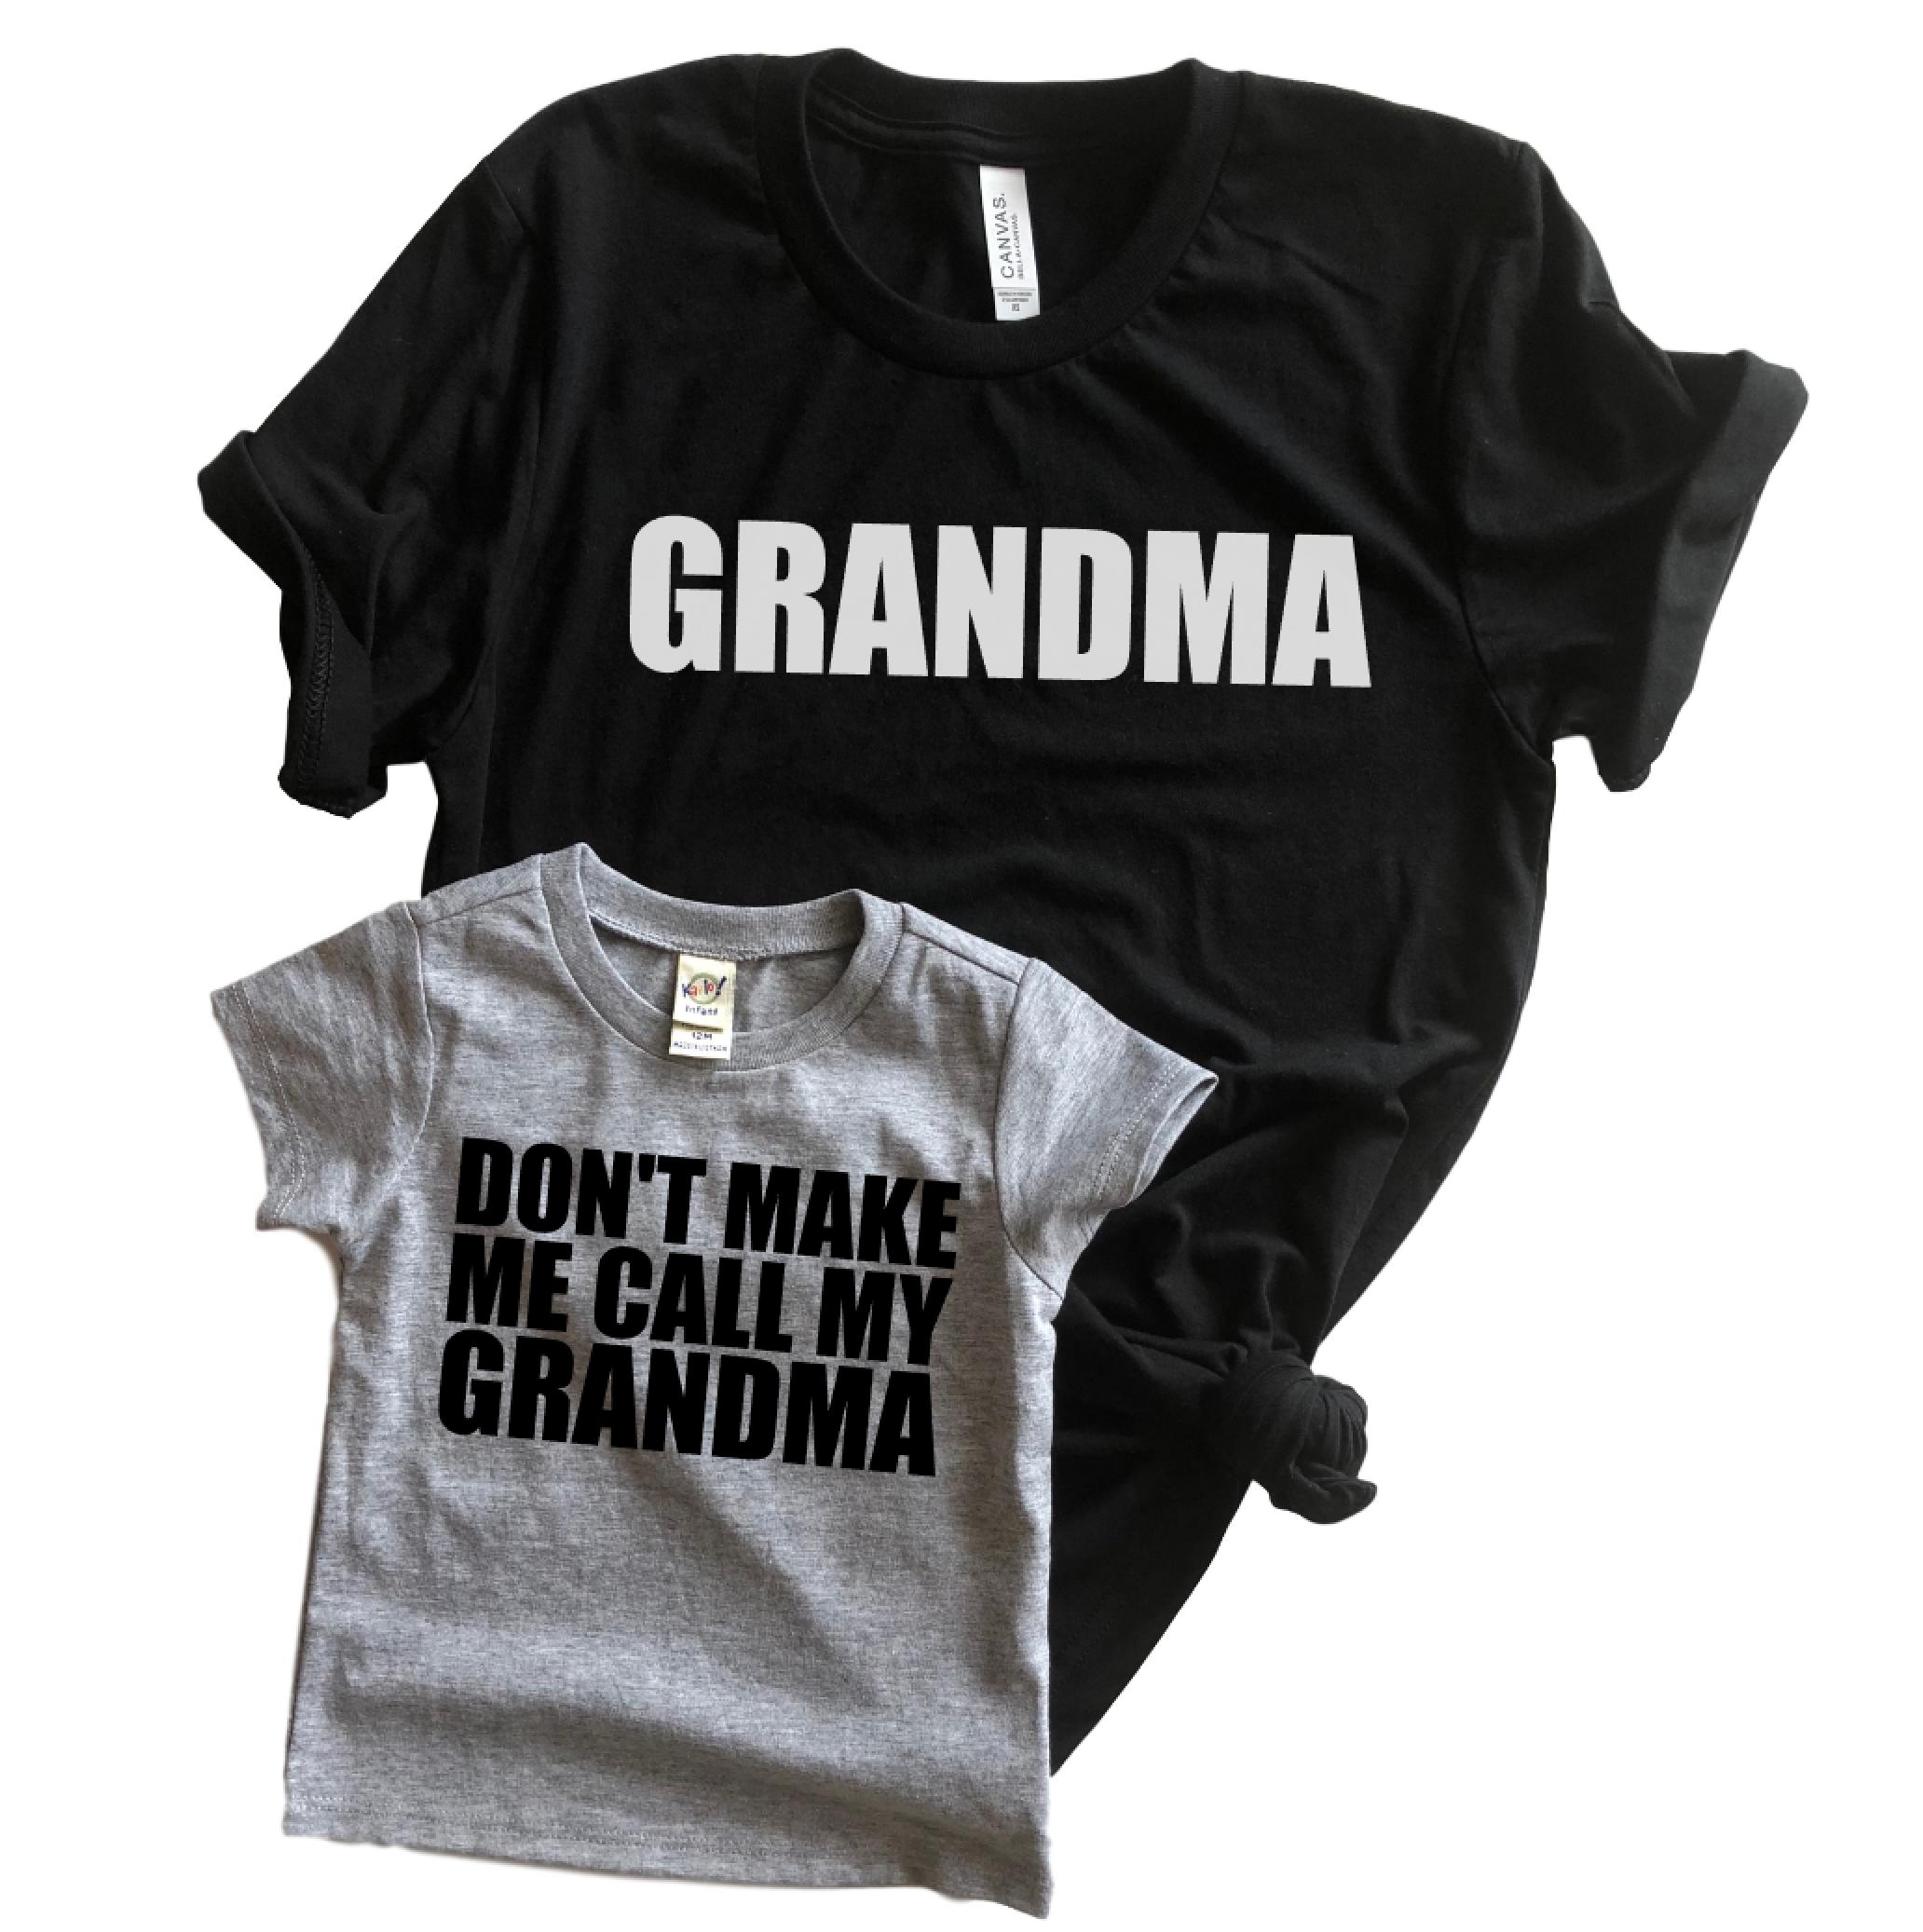 4bffe51f Don't make me call my Grandma matching set   Handmade for sale on ...